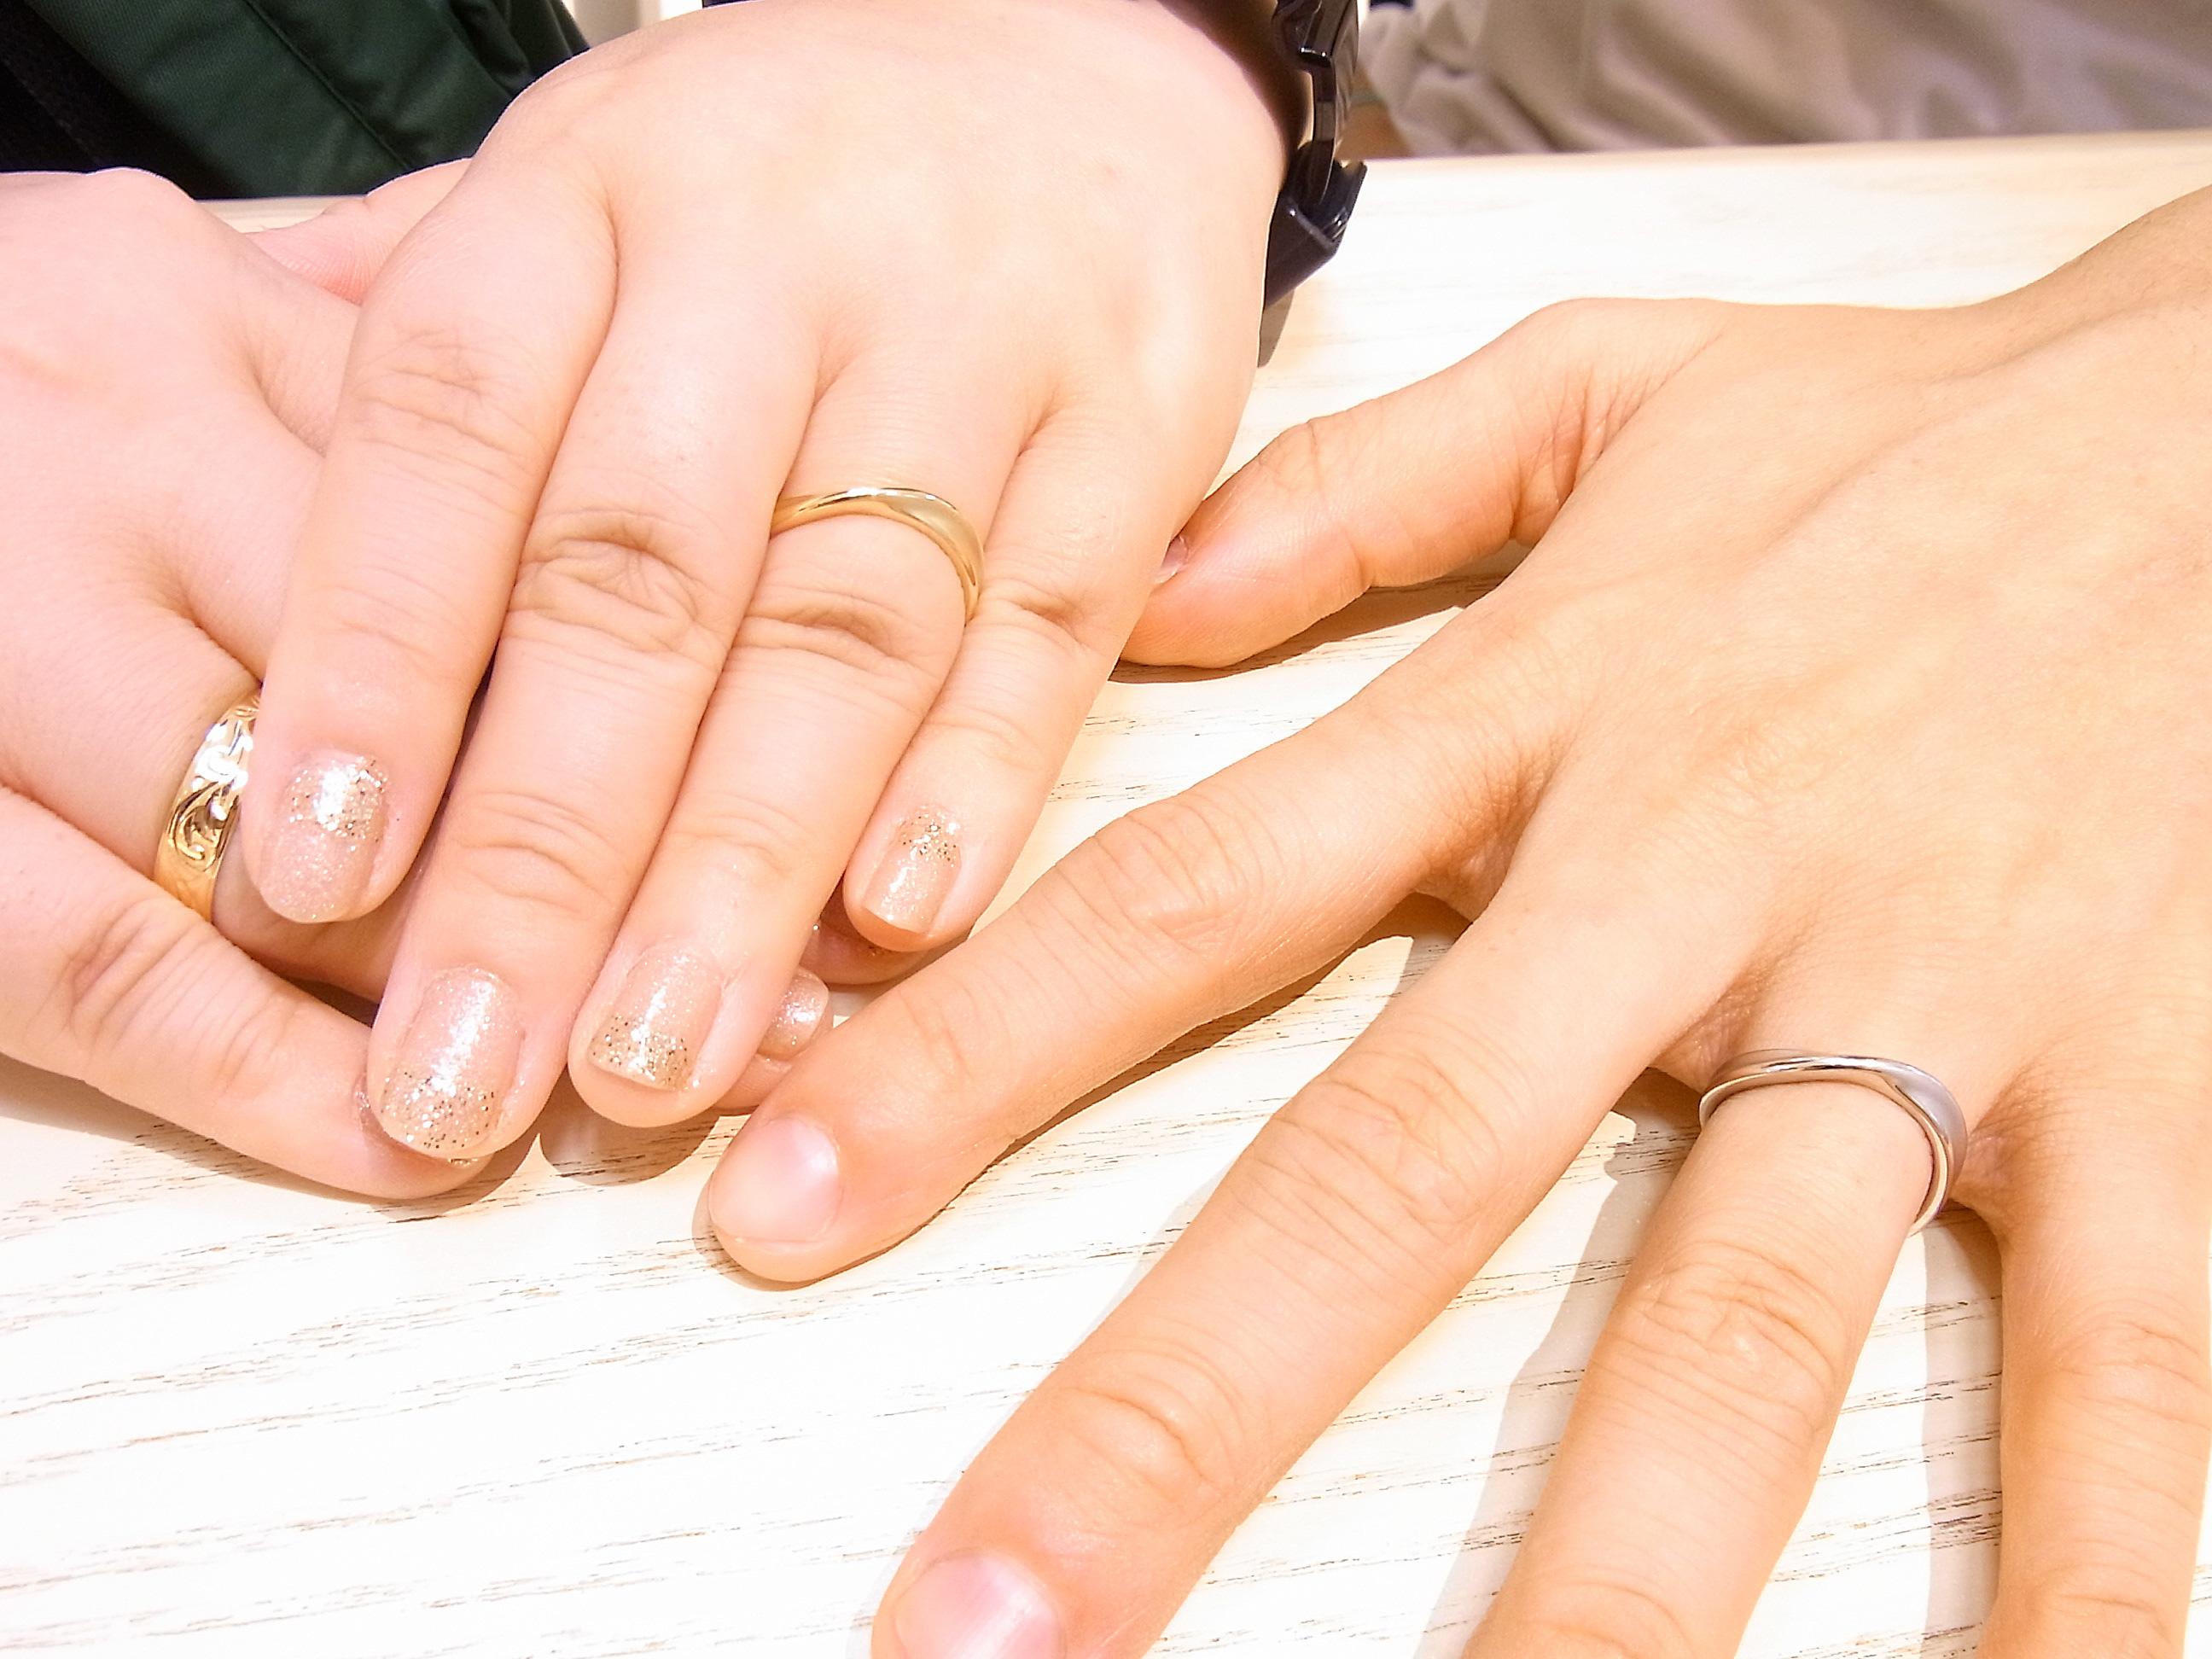 お客様結婚指輪着用写真